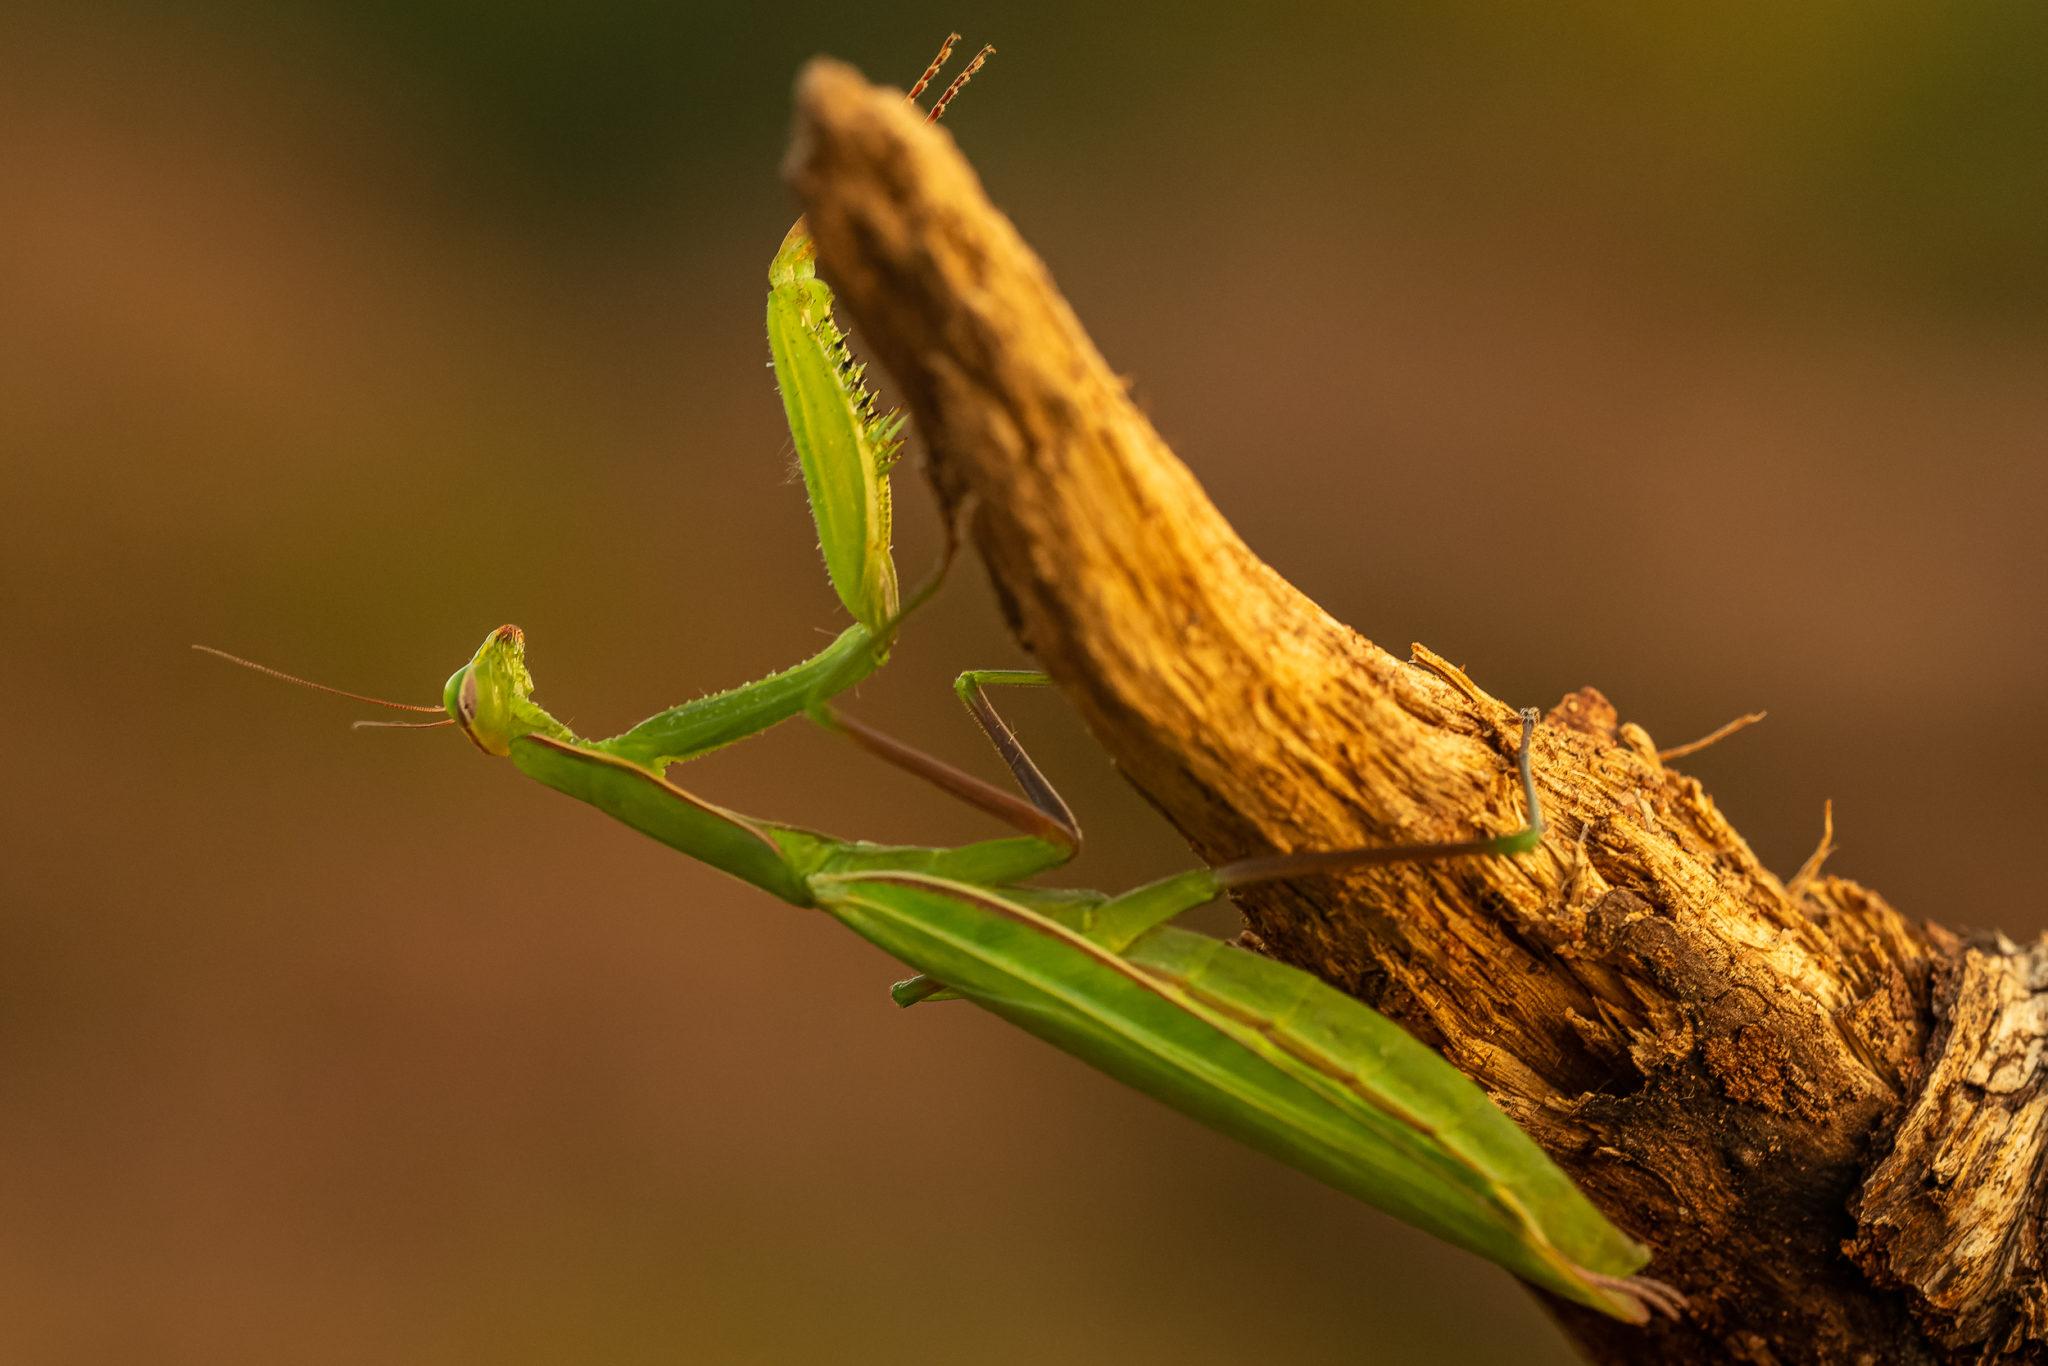 Europäische Gottesanbeterin (Mantis religiosa), Naturfotografie Sylvia & Olaf Rentzsch